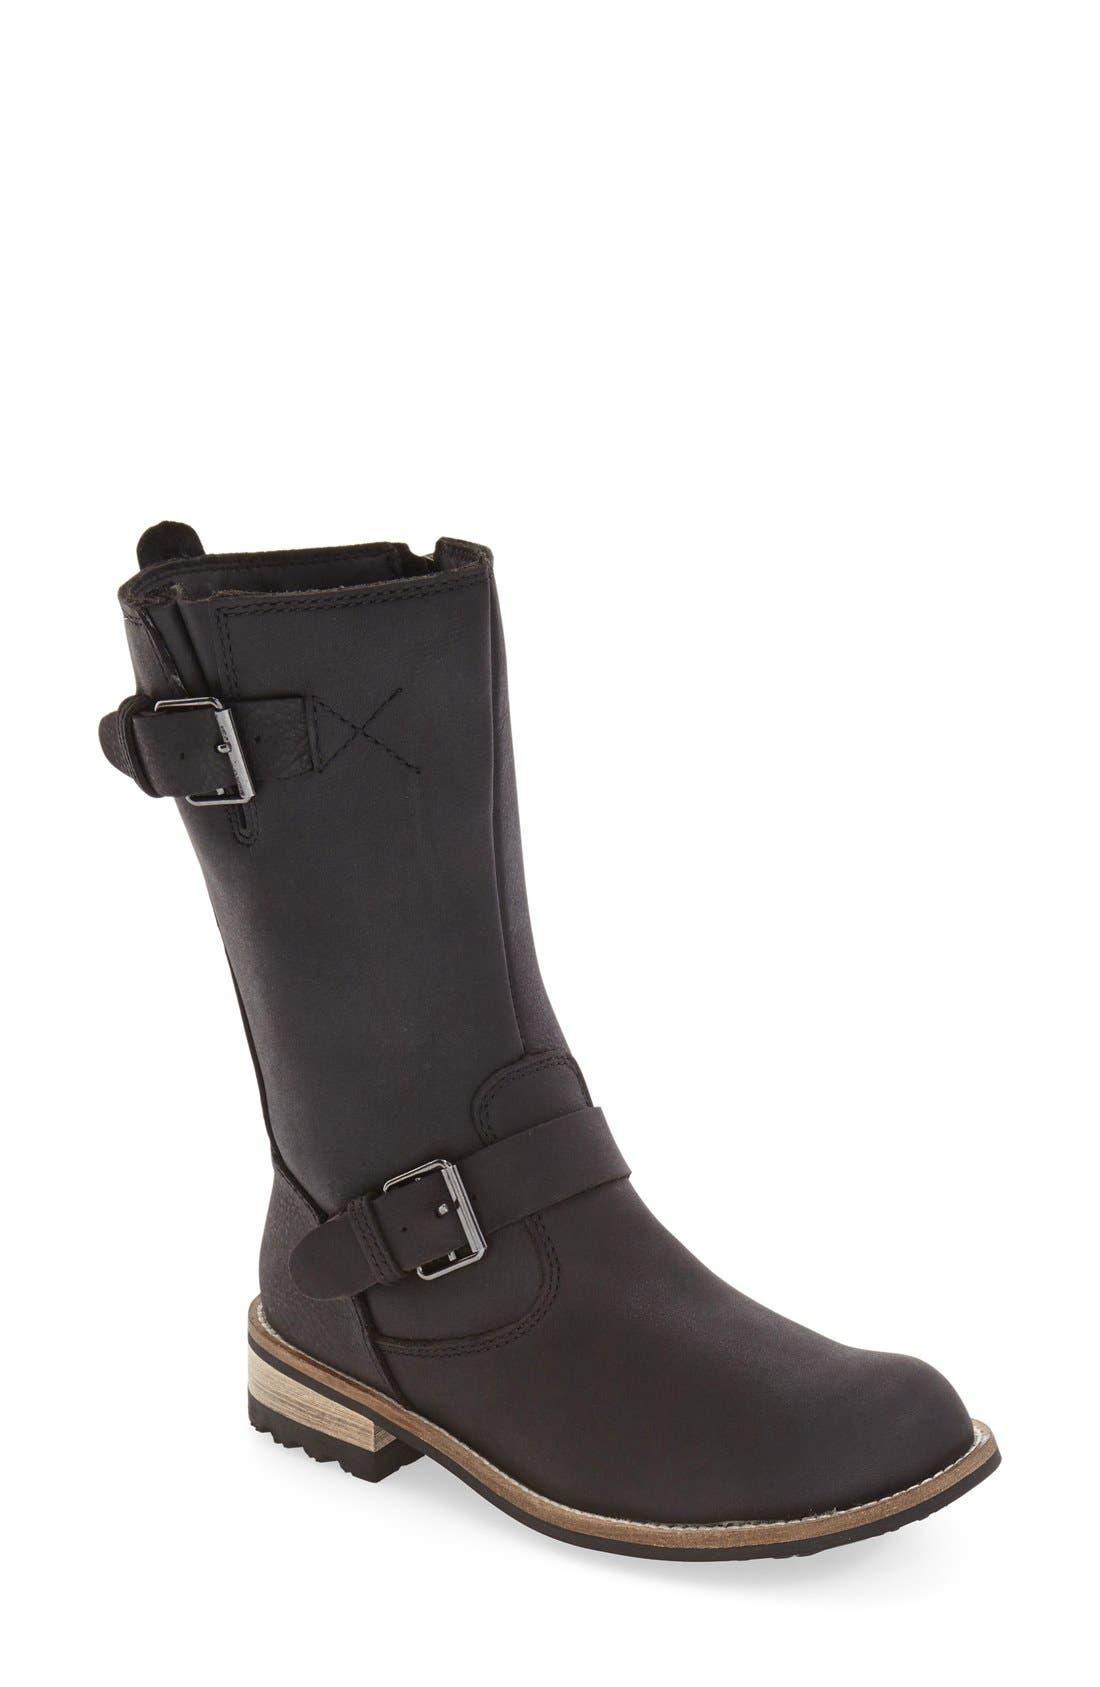 KODIAK,                             'Alcona' Waterproof Boot,                             Main thumbnail 1, color,                             BLACK LEATHER